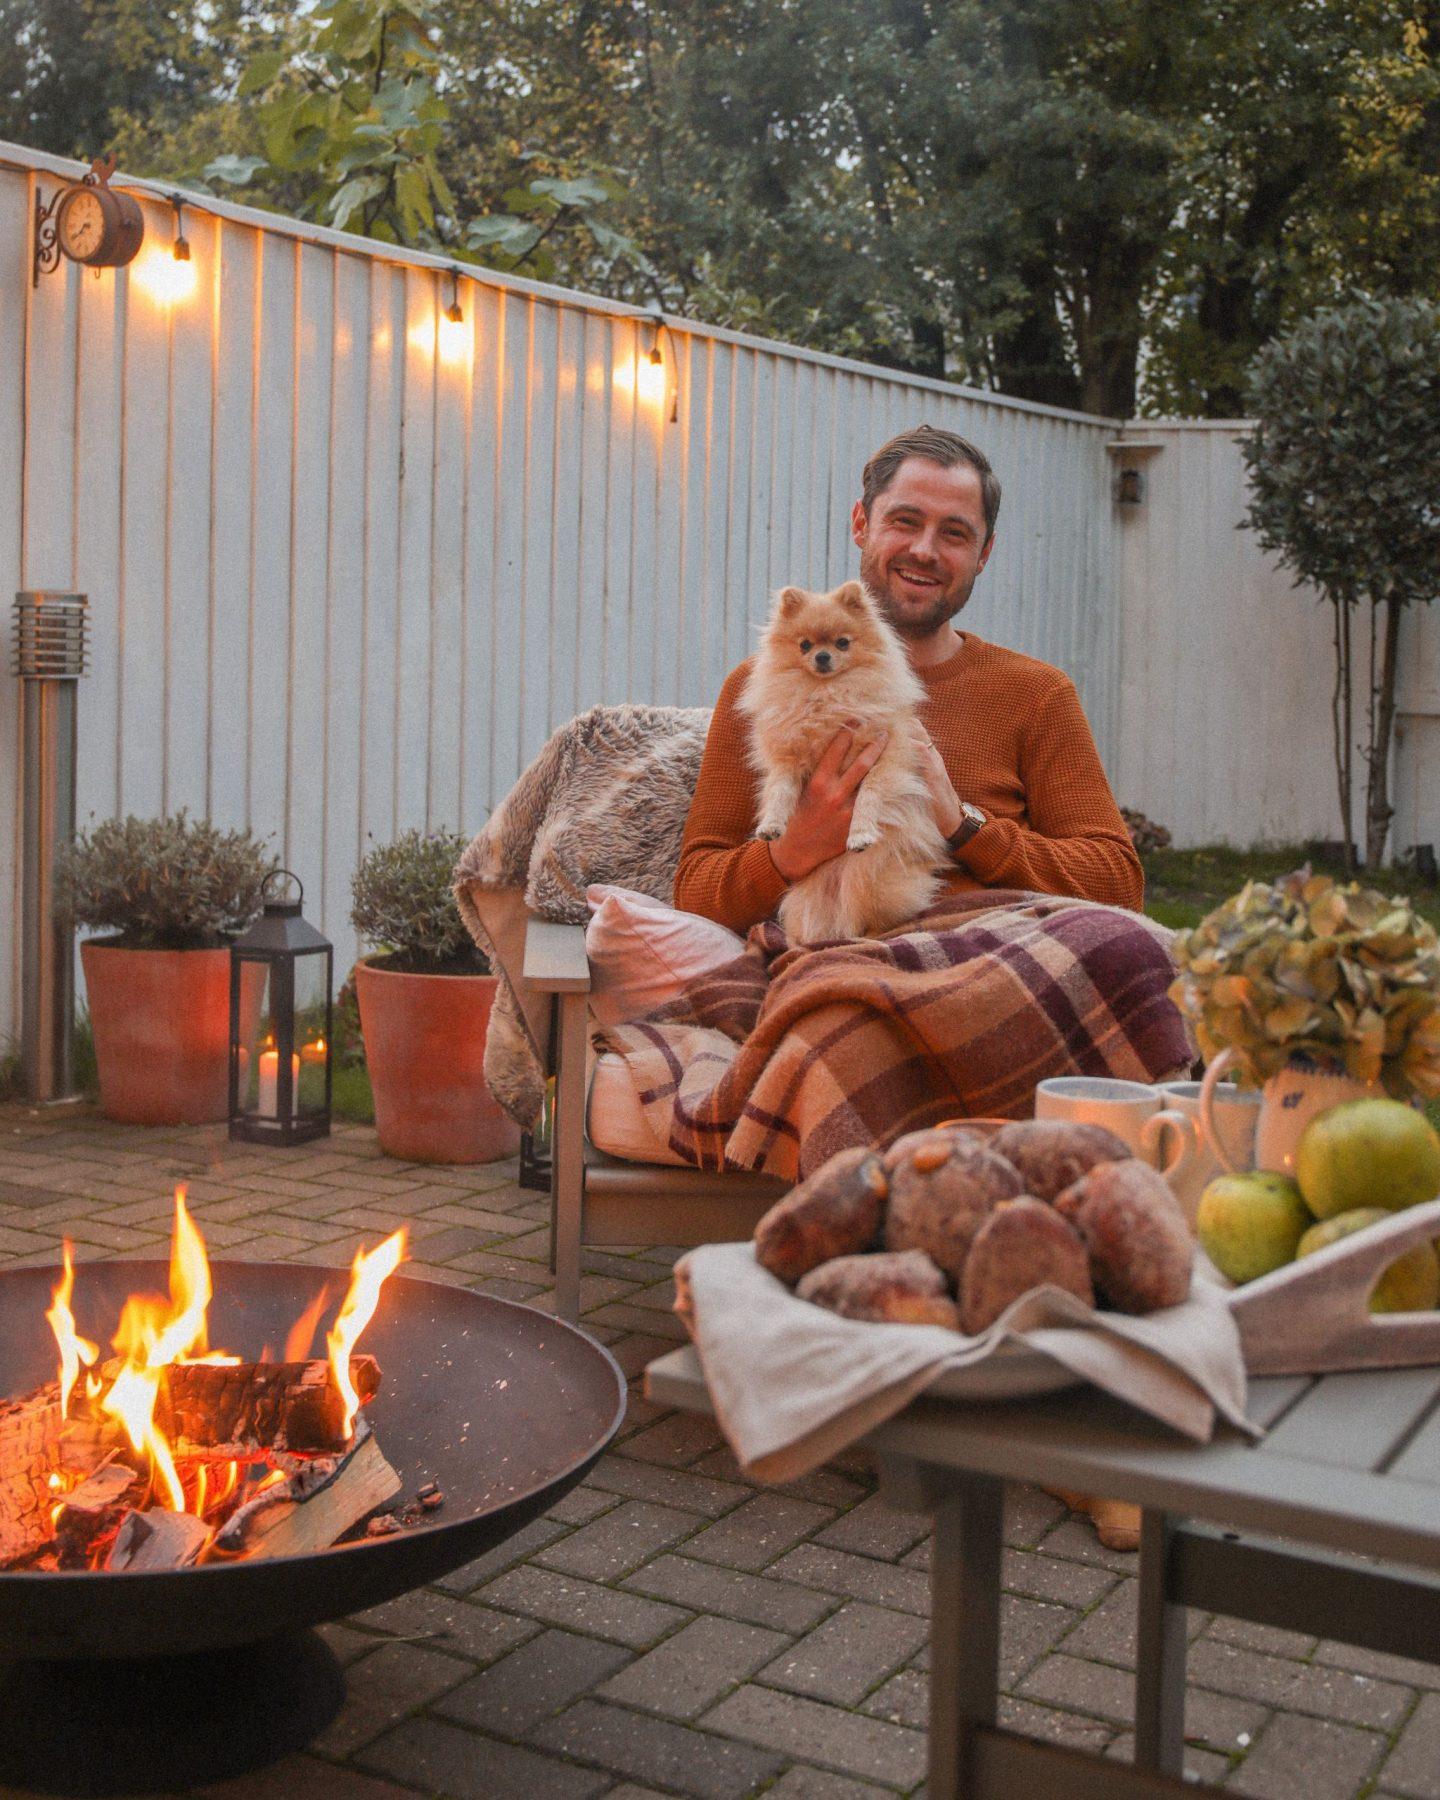 The perfect autumn hygge set up, Ben Heath, KALANCHOE